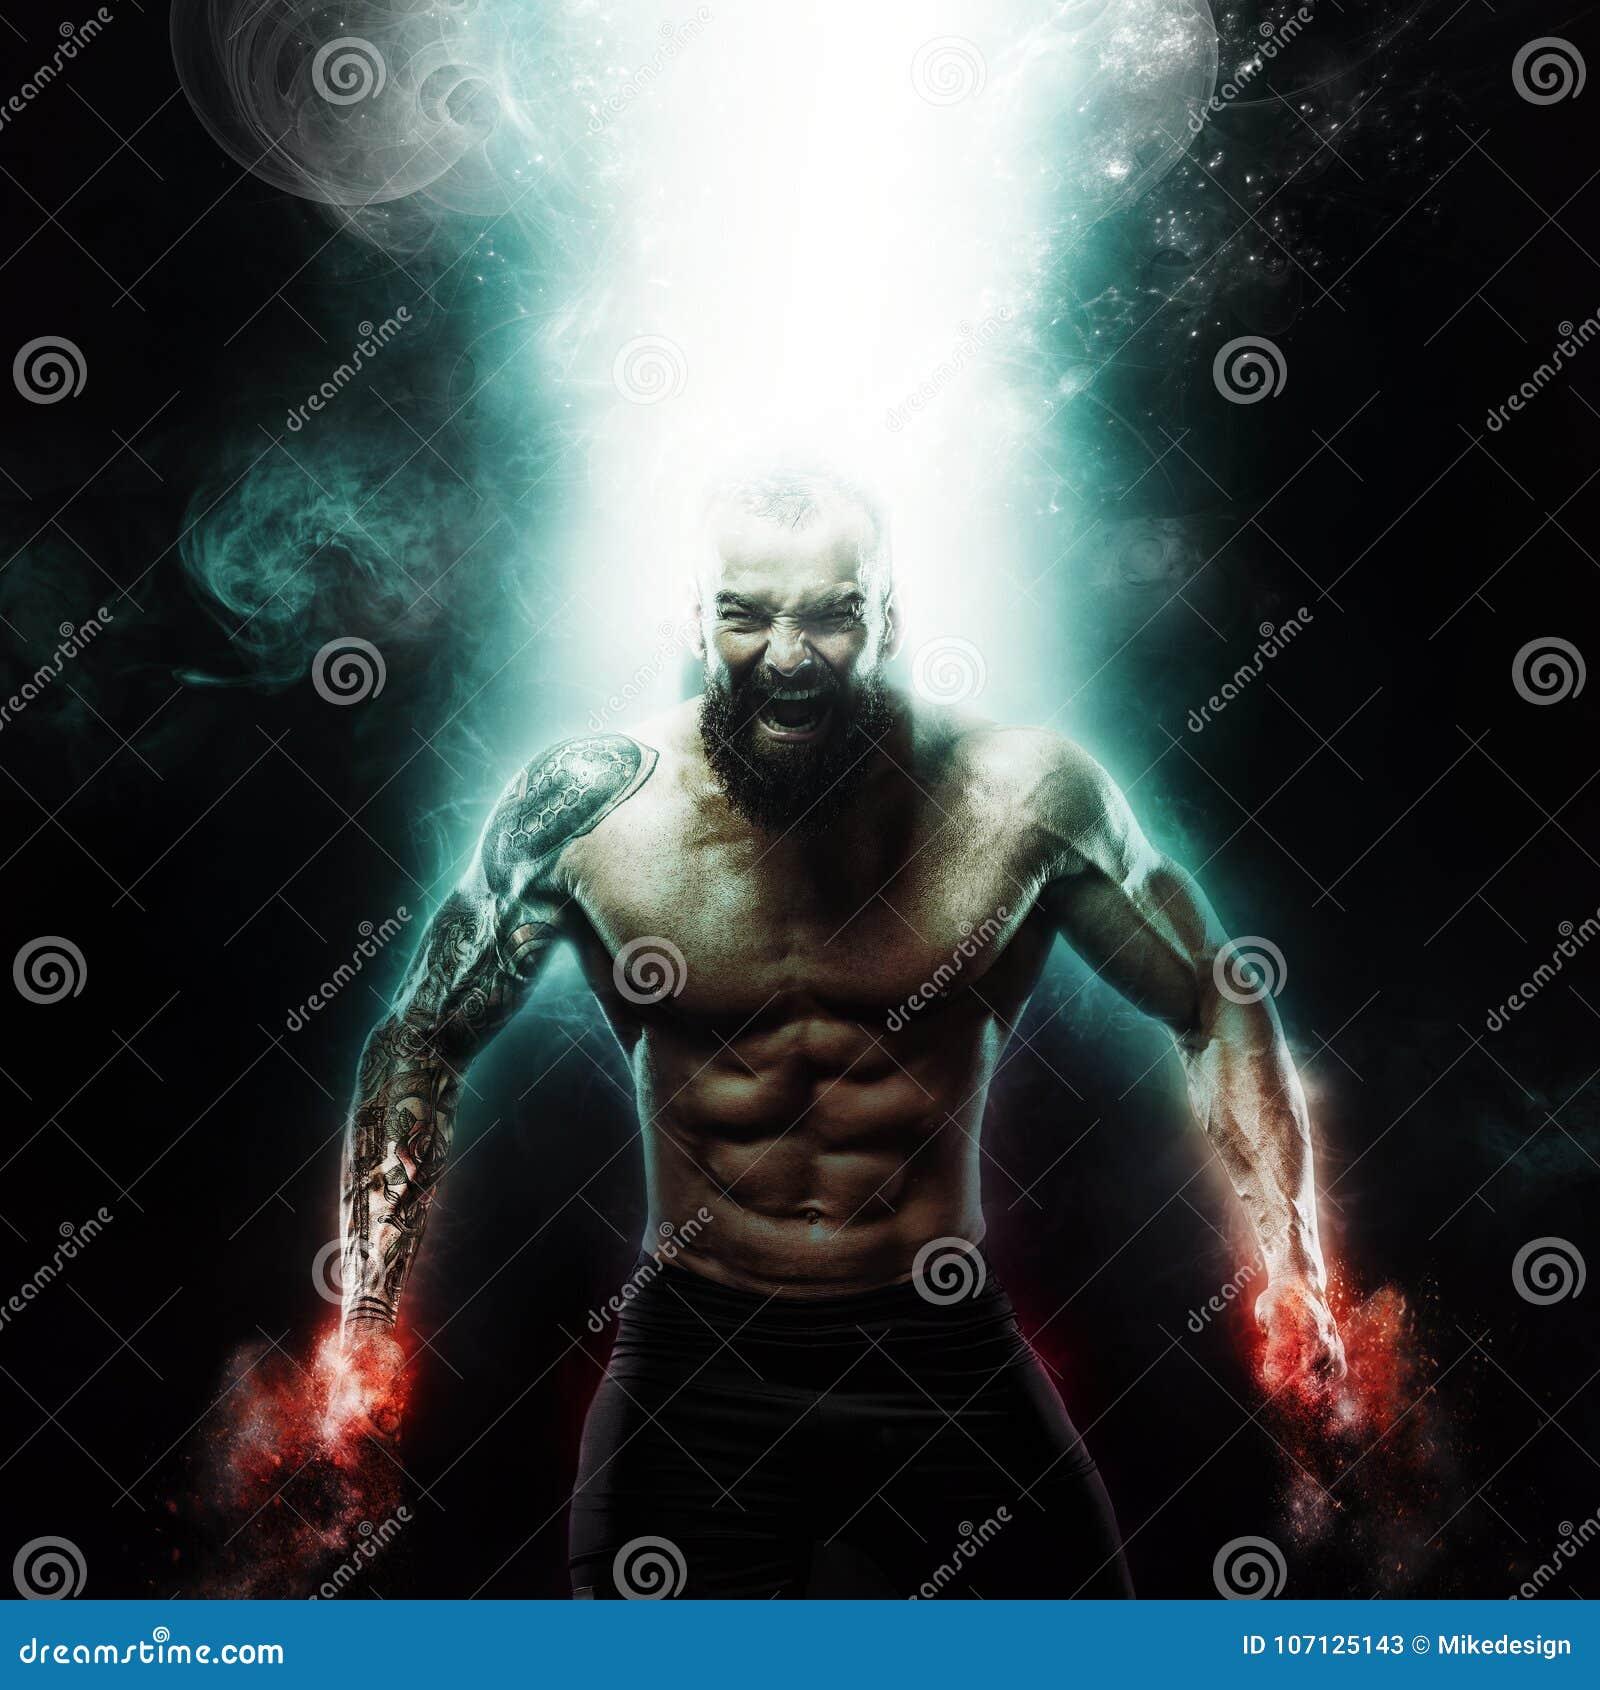 Sport And Motivation Wallpaper On Dark Background Power Athletic Guy Bodybuilder Fire Energy